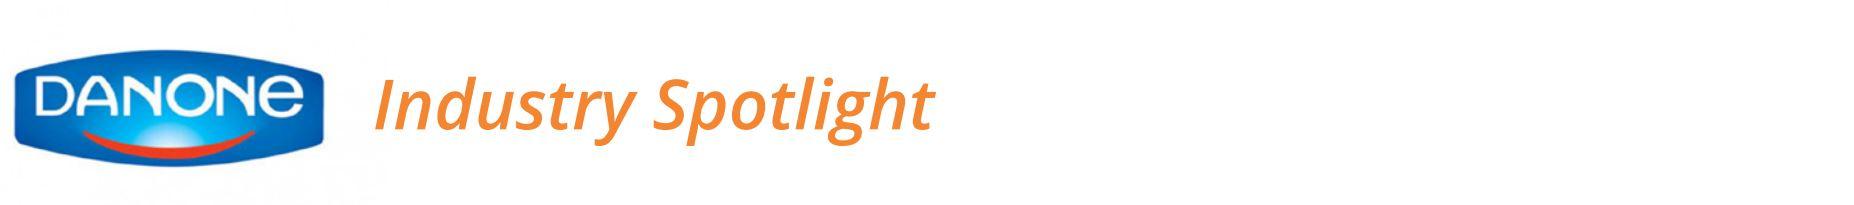 Danone Nutrica Industry Spotlight